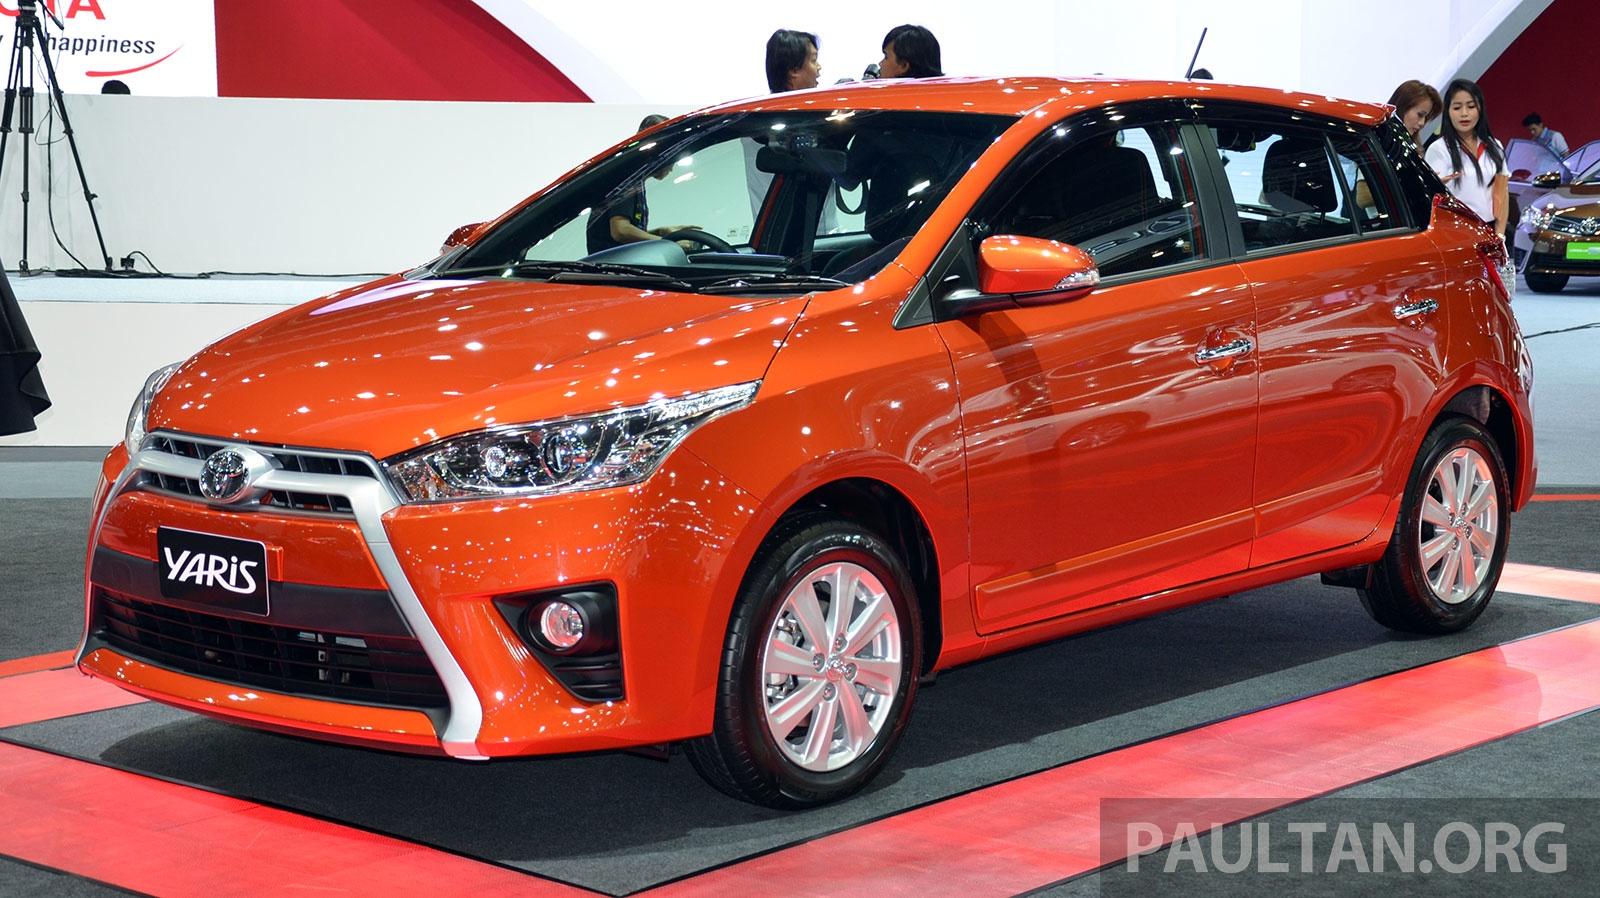 Bangkok 2014: Toyota Yaris 1.2L hatchback, Thai-spec Paul ...